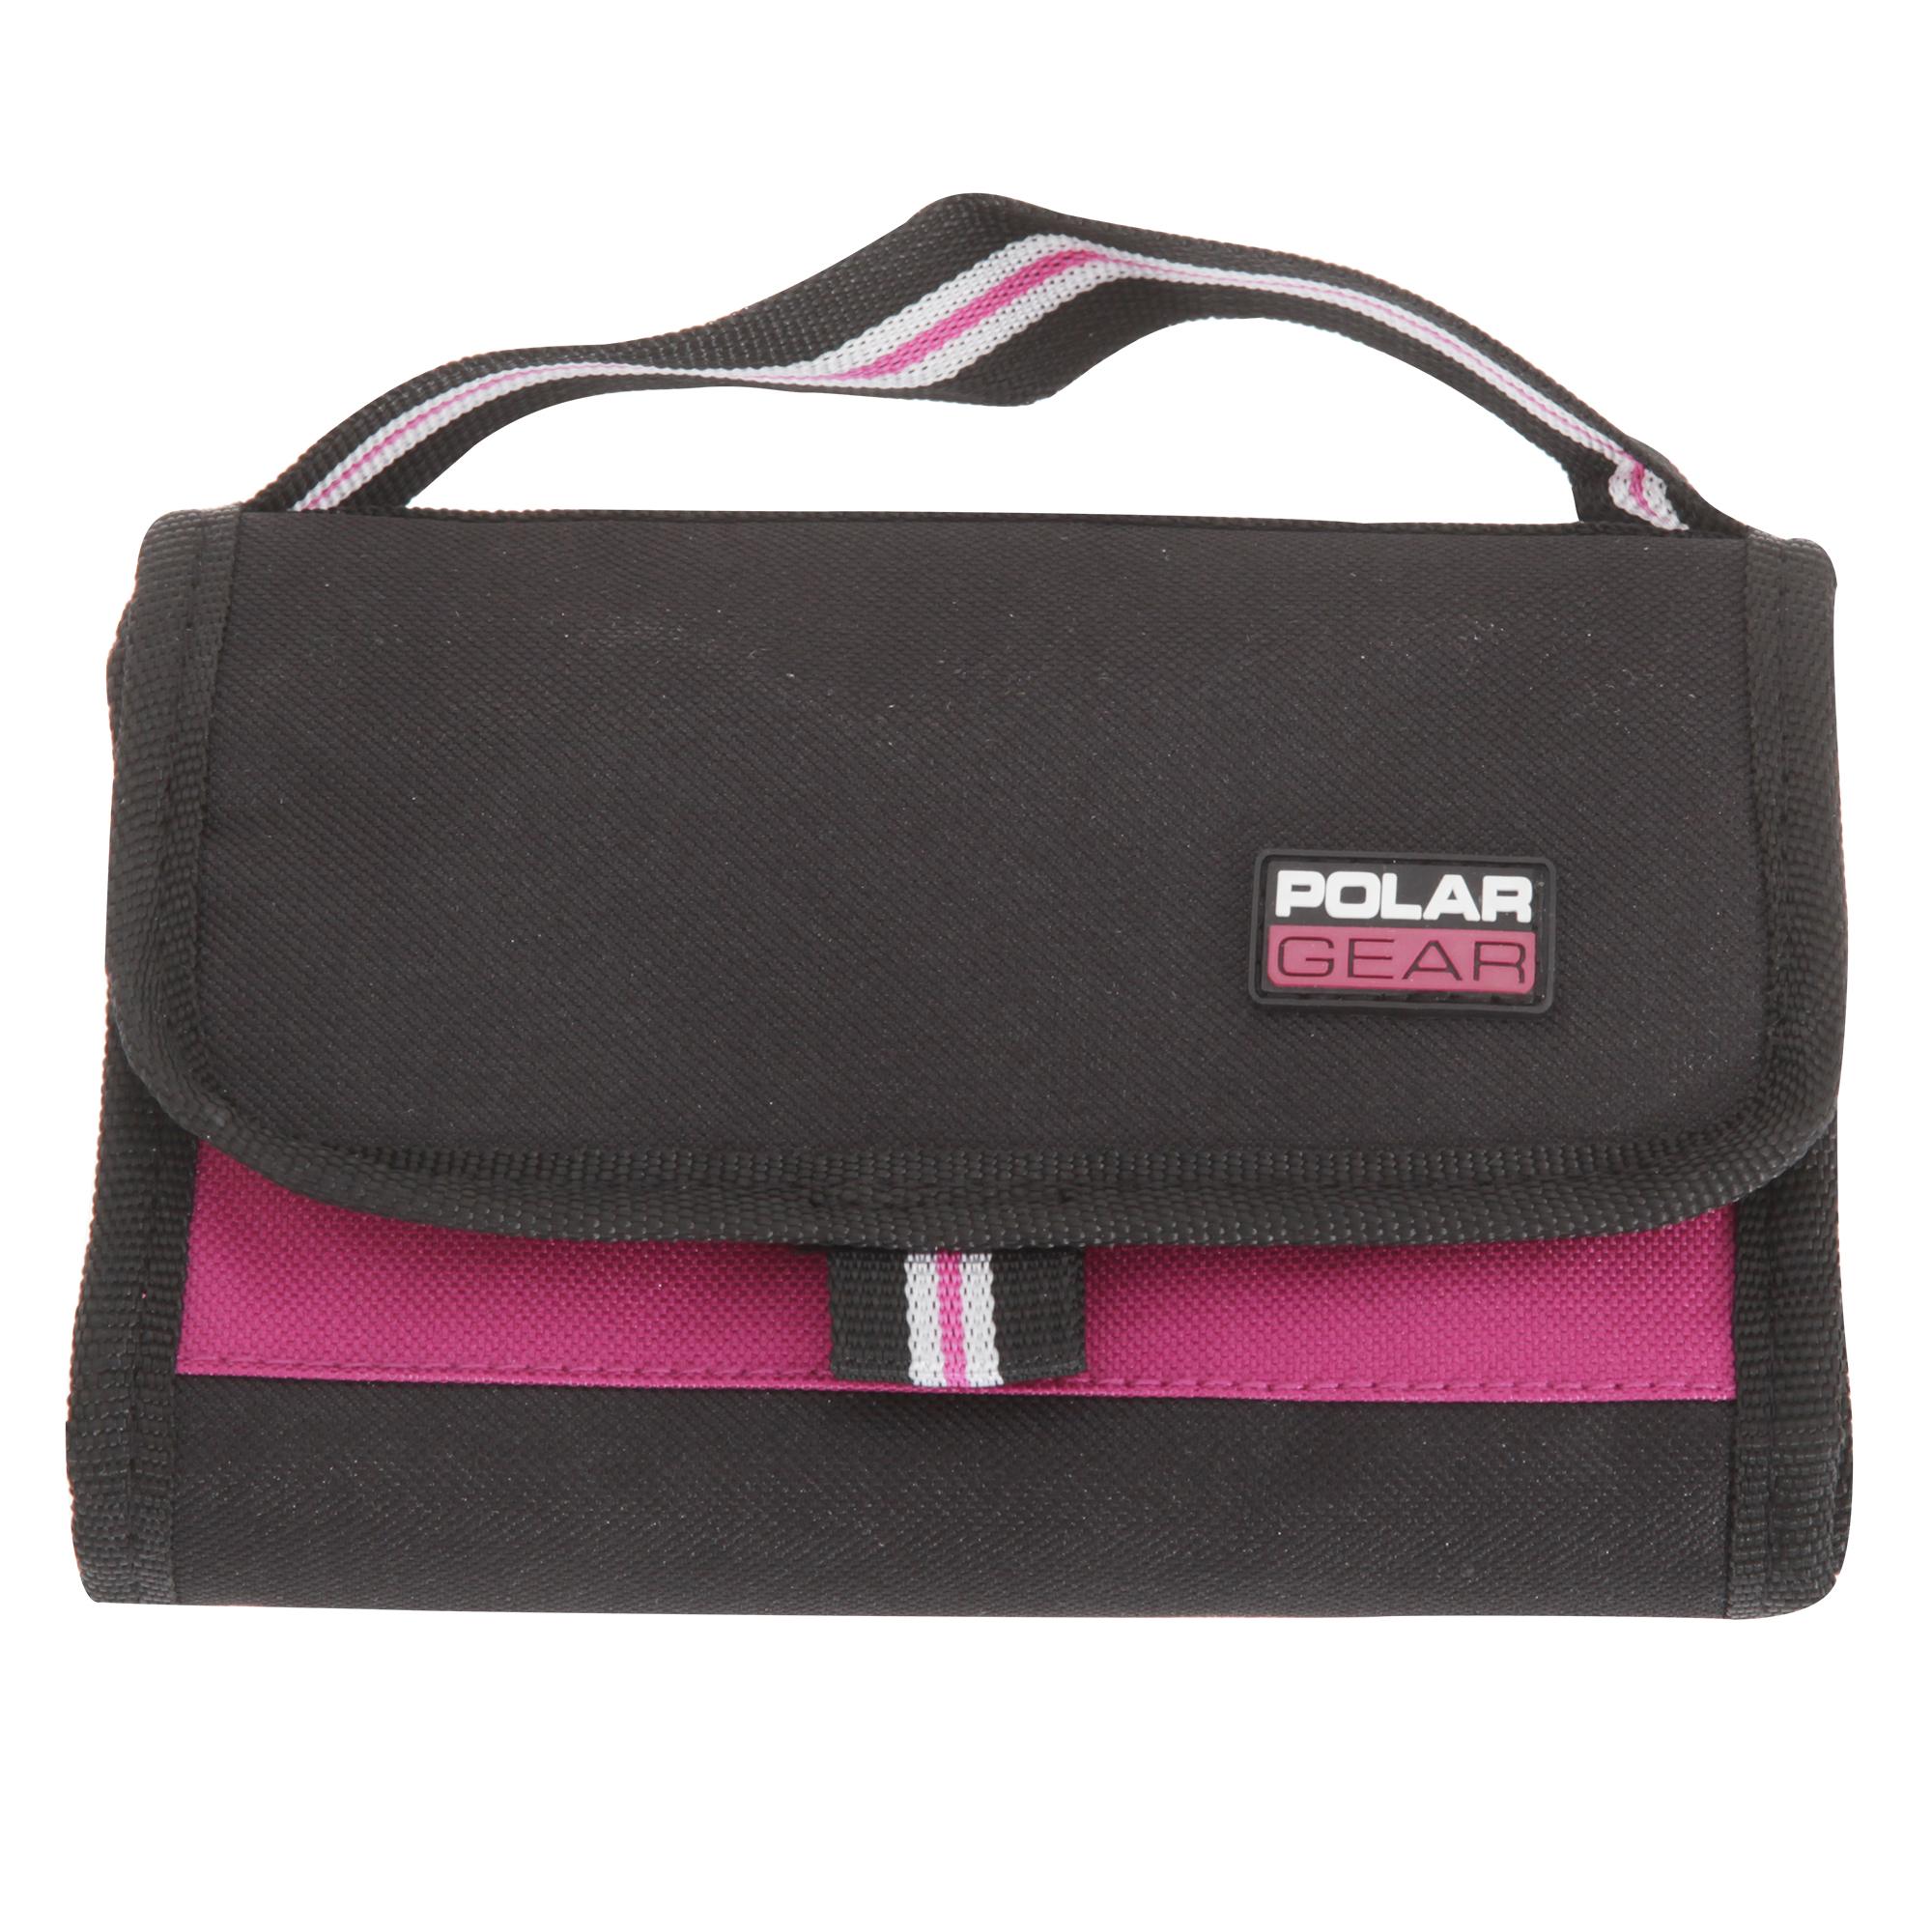 polar gear active folding insulated lunch bag cooler ebay